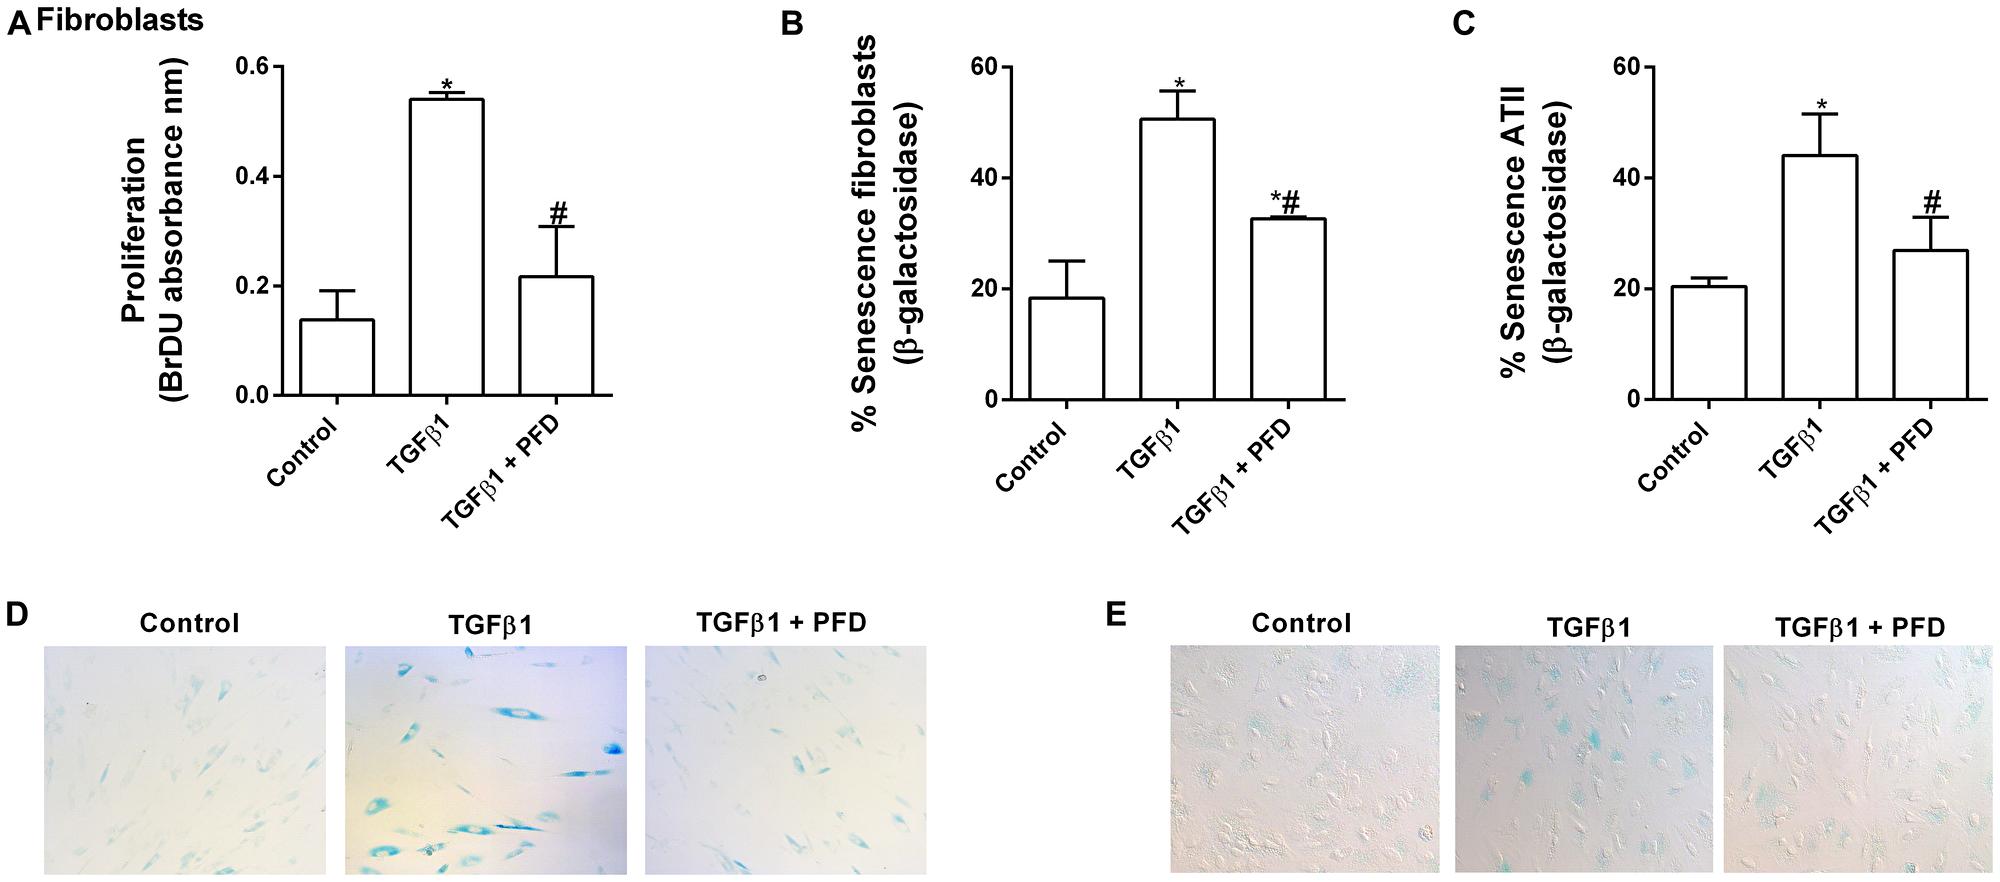 Pirfenidone (PFD) attenuates TGF-β1-induced lung fibroblast proliferation and senescence of epithelial alveolar type II (ATII) cells and fibroblasts.